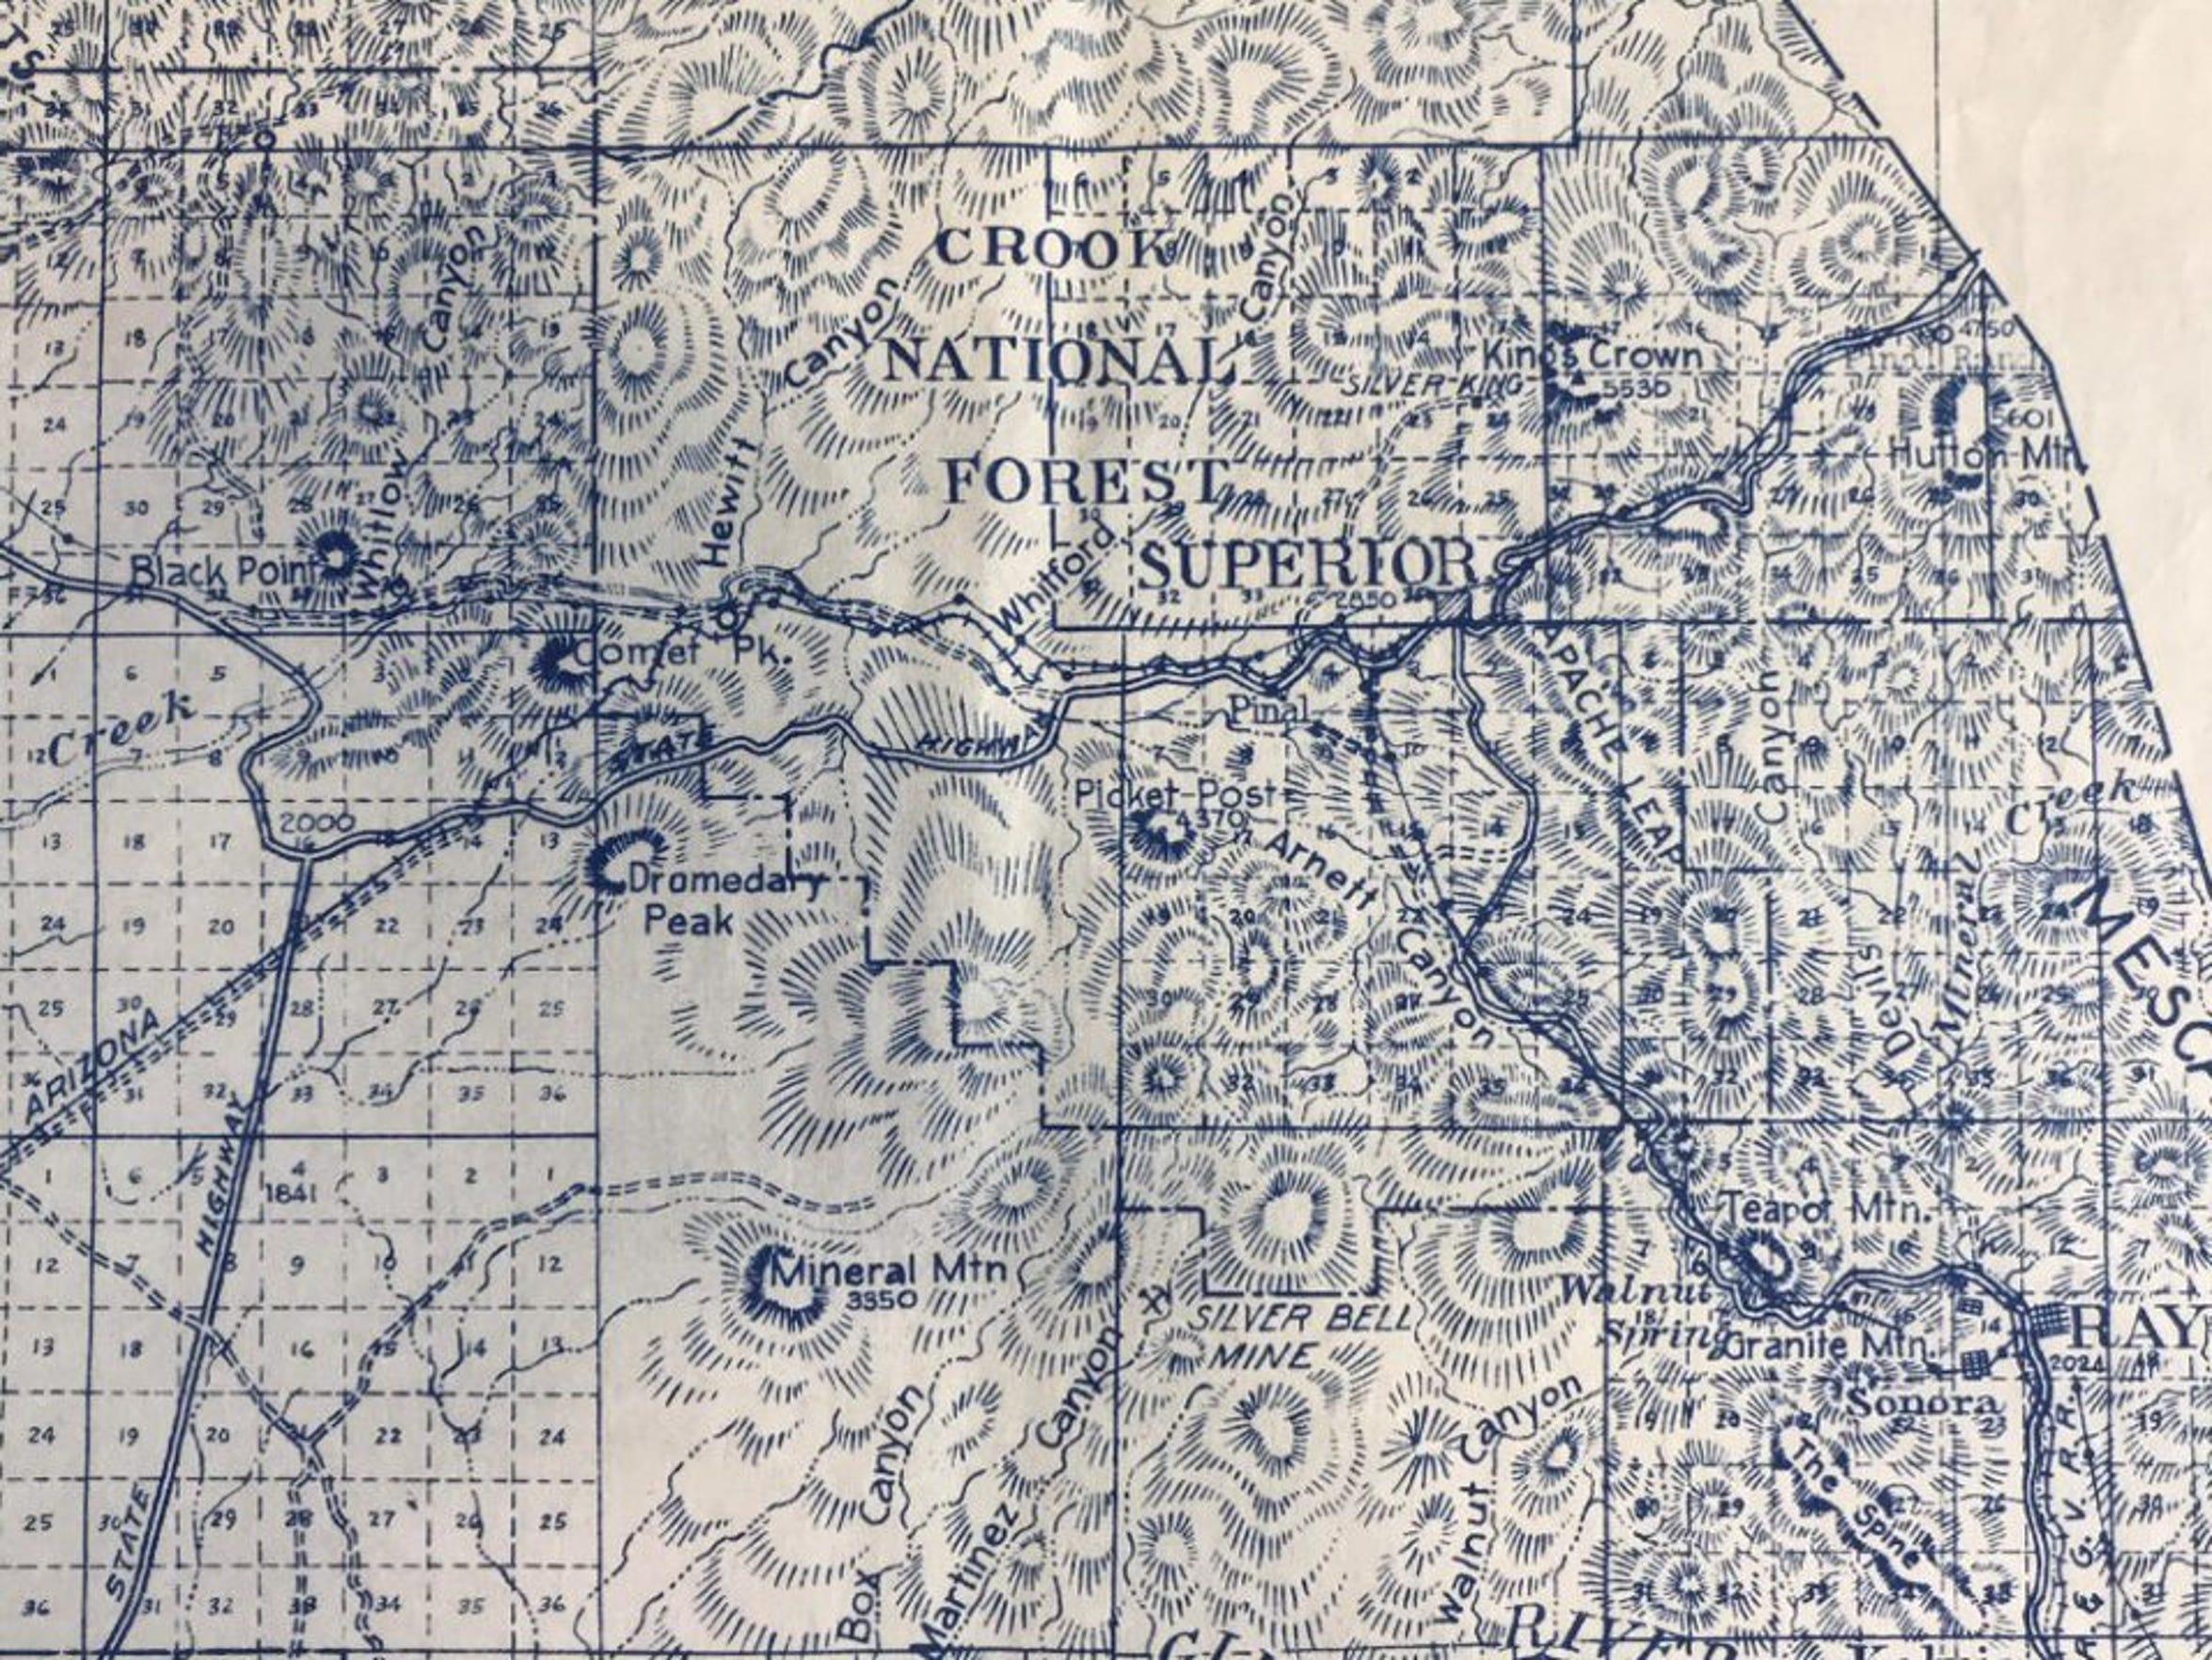 Roadmap of Superior, Arizona in 1927.